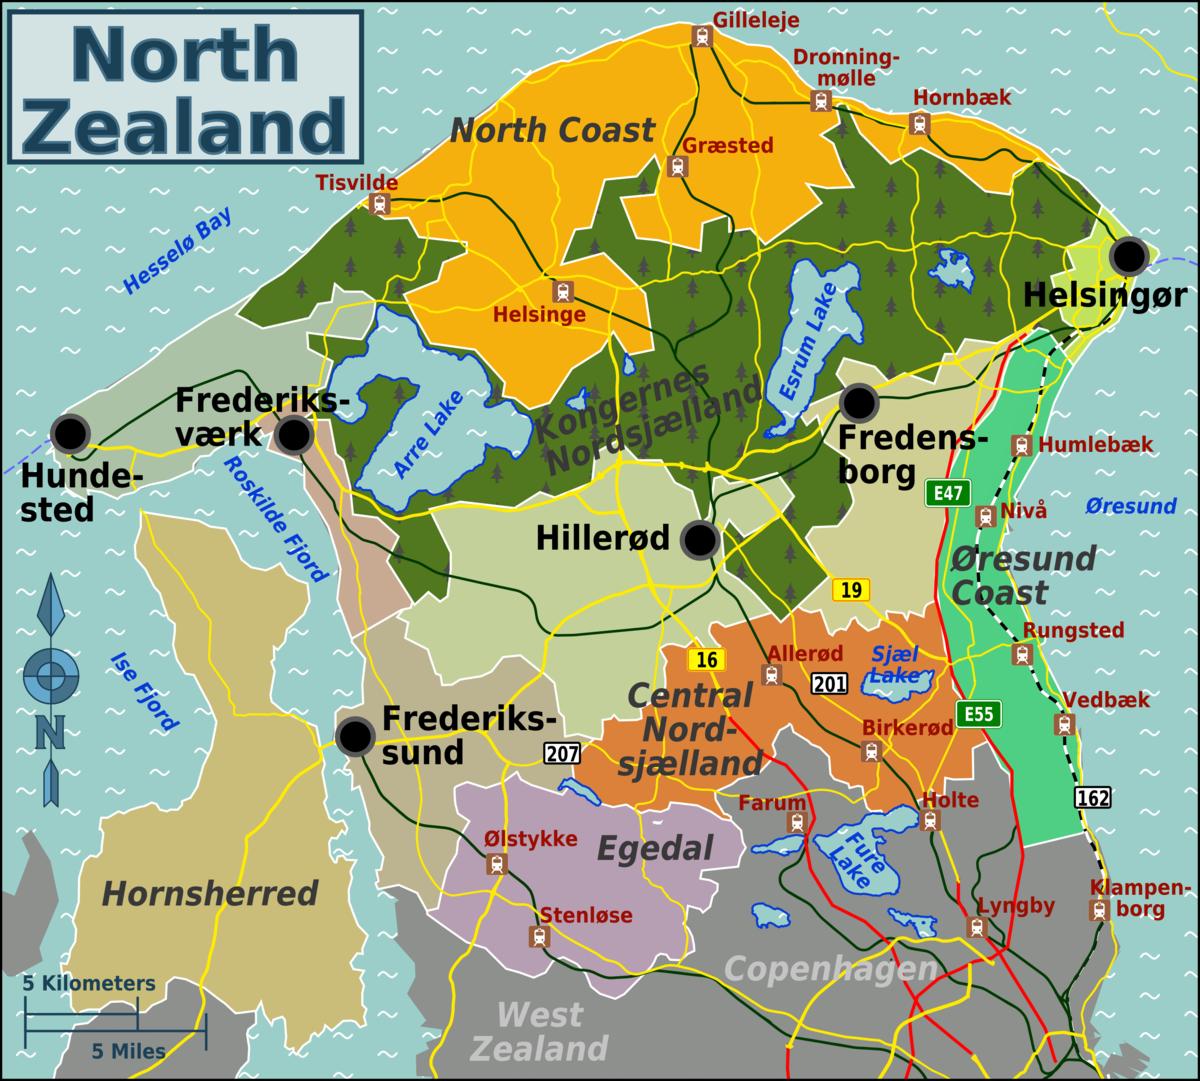 North Zealand Wikipedia